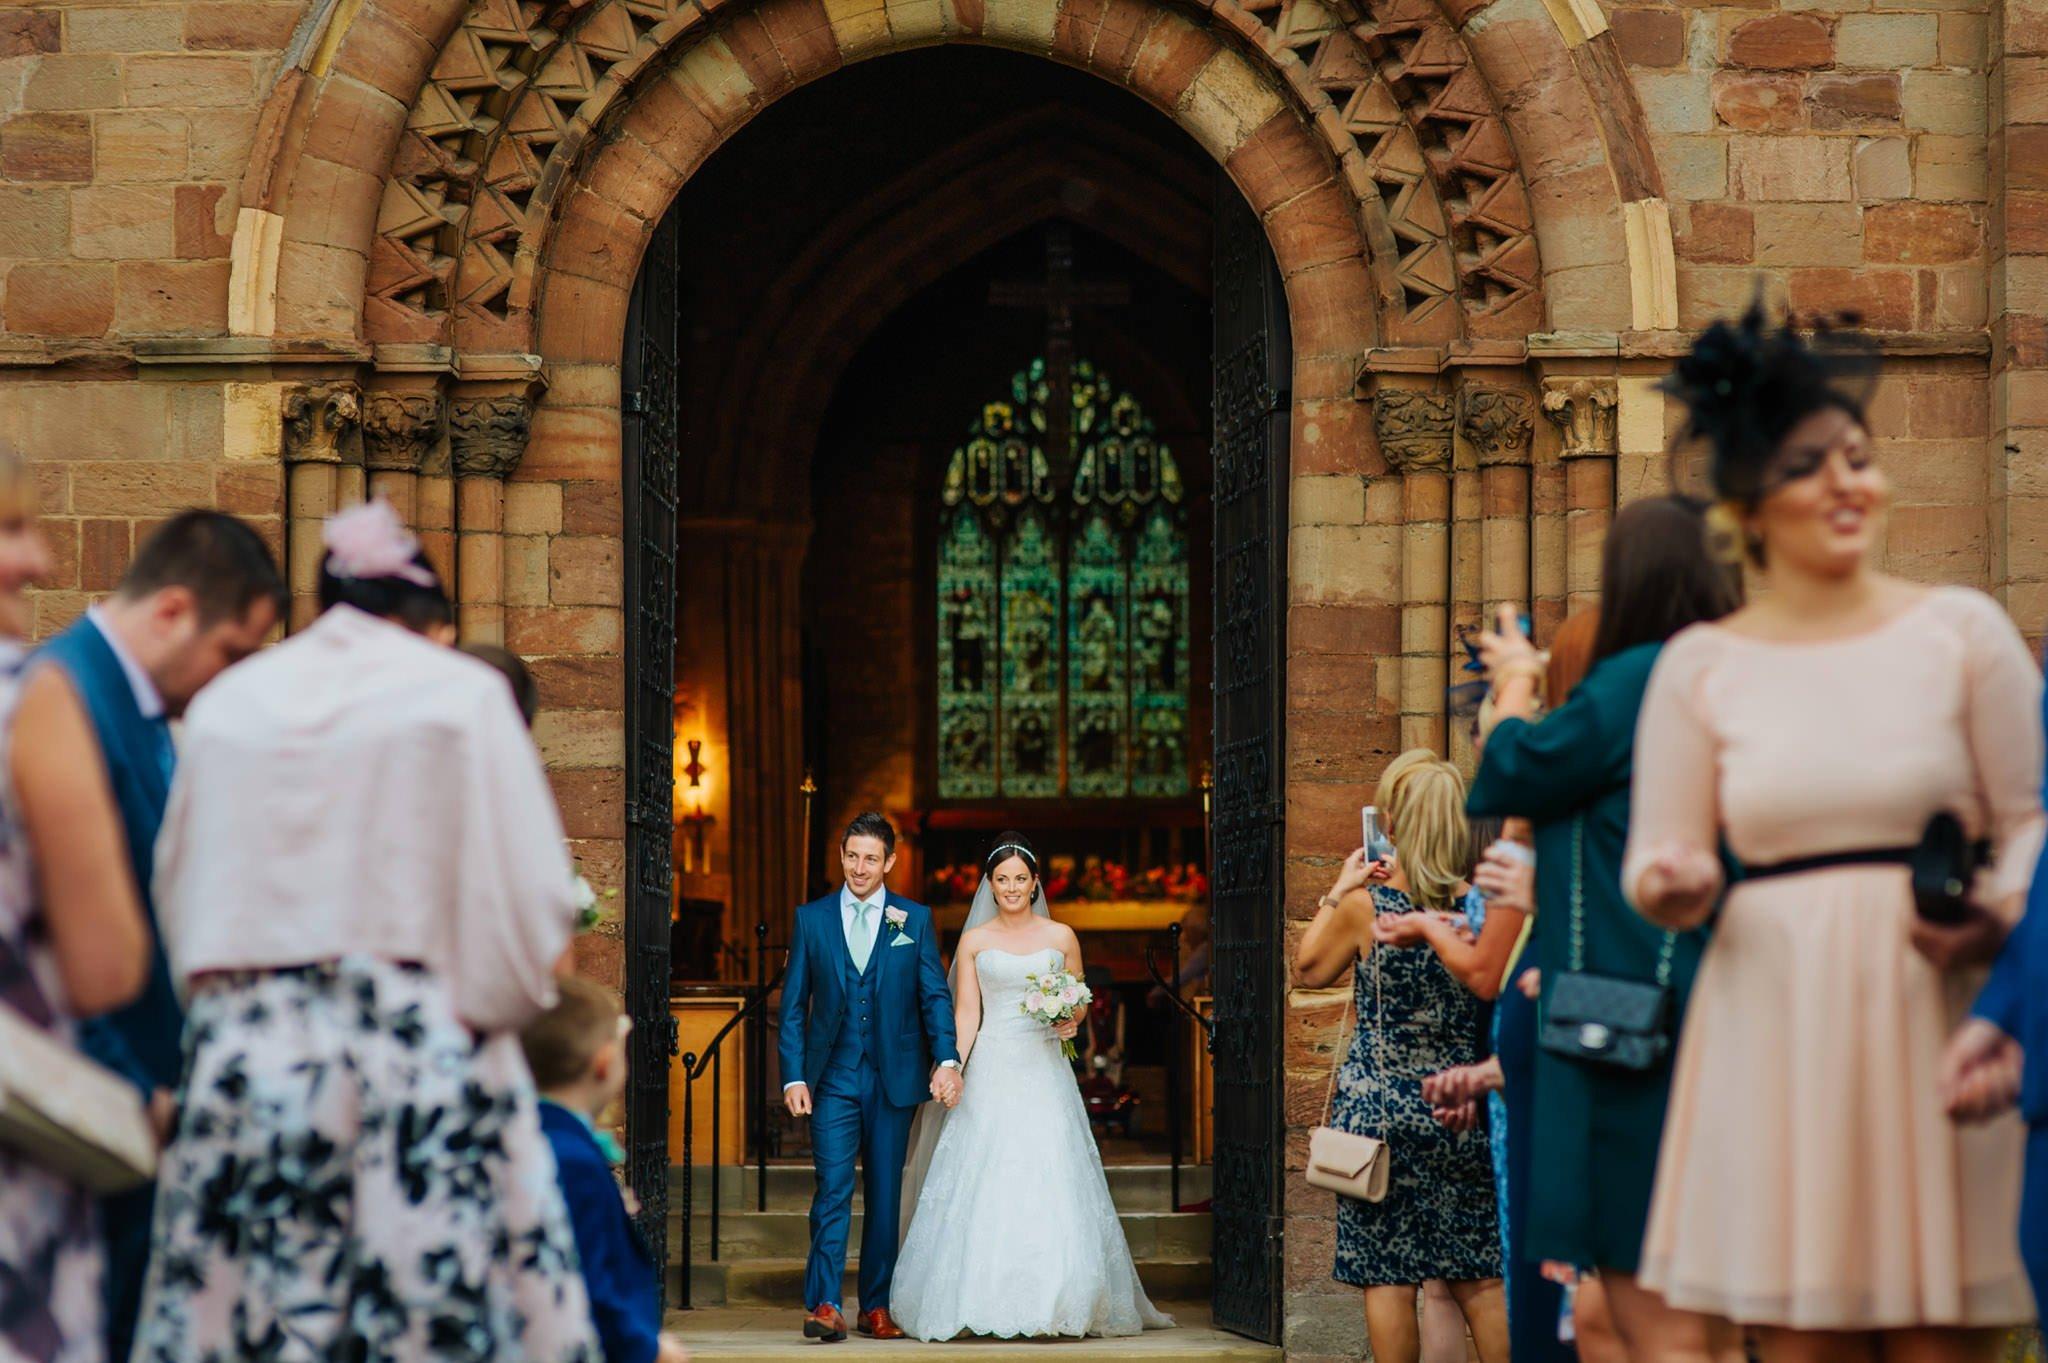 Eastnor Castle wedding photographer Herefordshire, West Midlands - Sarah + Dean 31